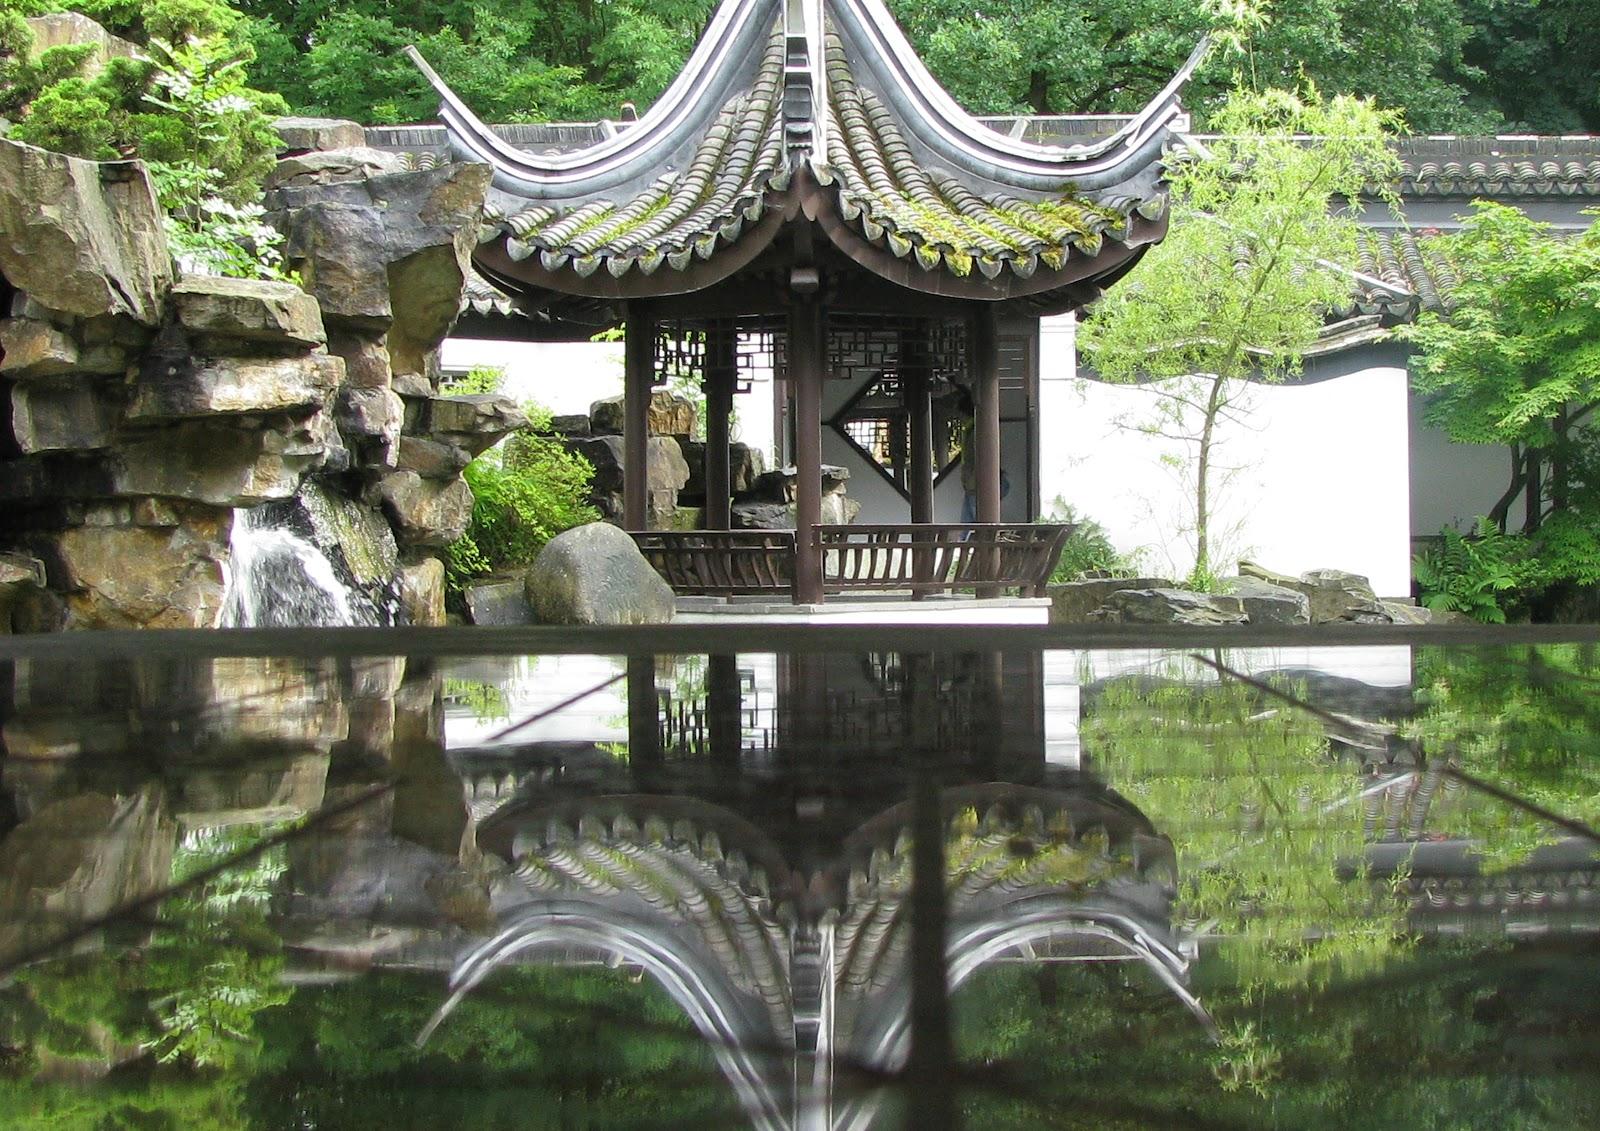 Crown of creation japanischer garten bochum for Japanischer garten